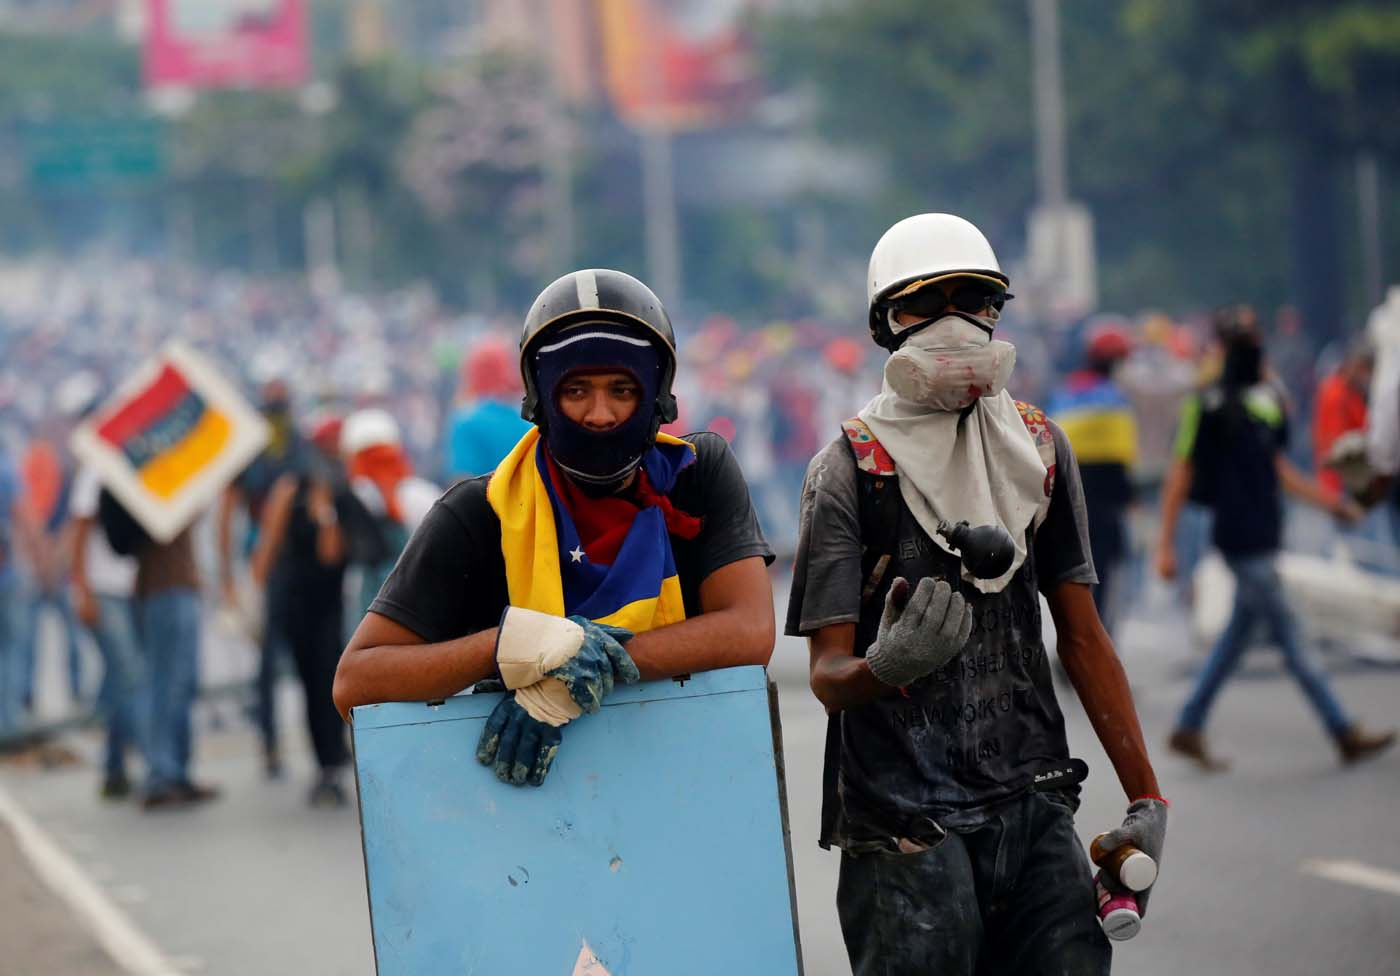 Opposition supporters look on while rallying against Venezuelan President Nicolas Maduro in Caracas, Venezuela, May 8, 2017. REUTERS/Carlos Garcia Rawlins